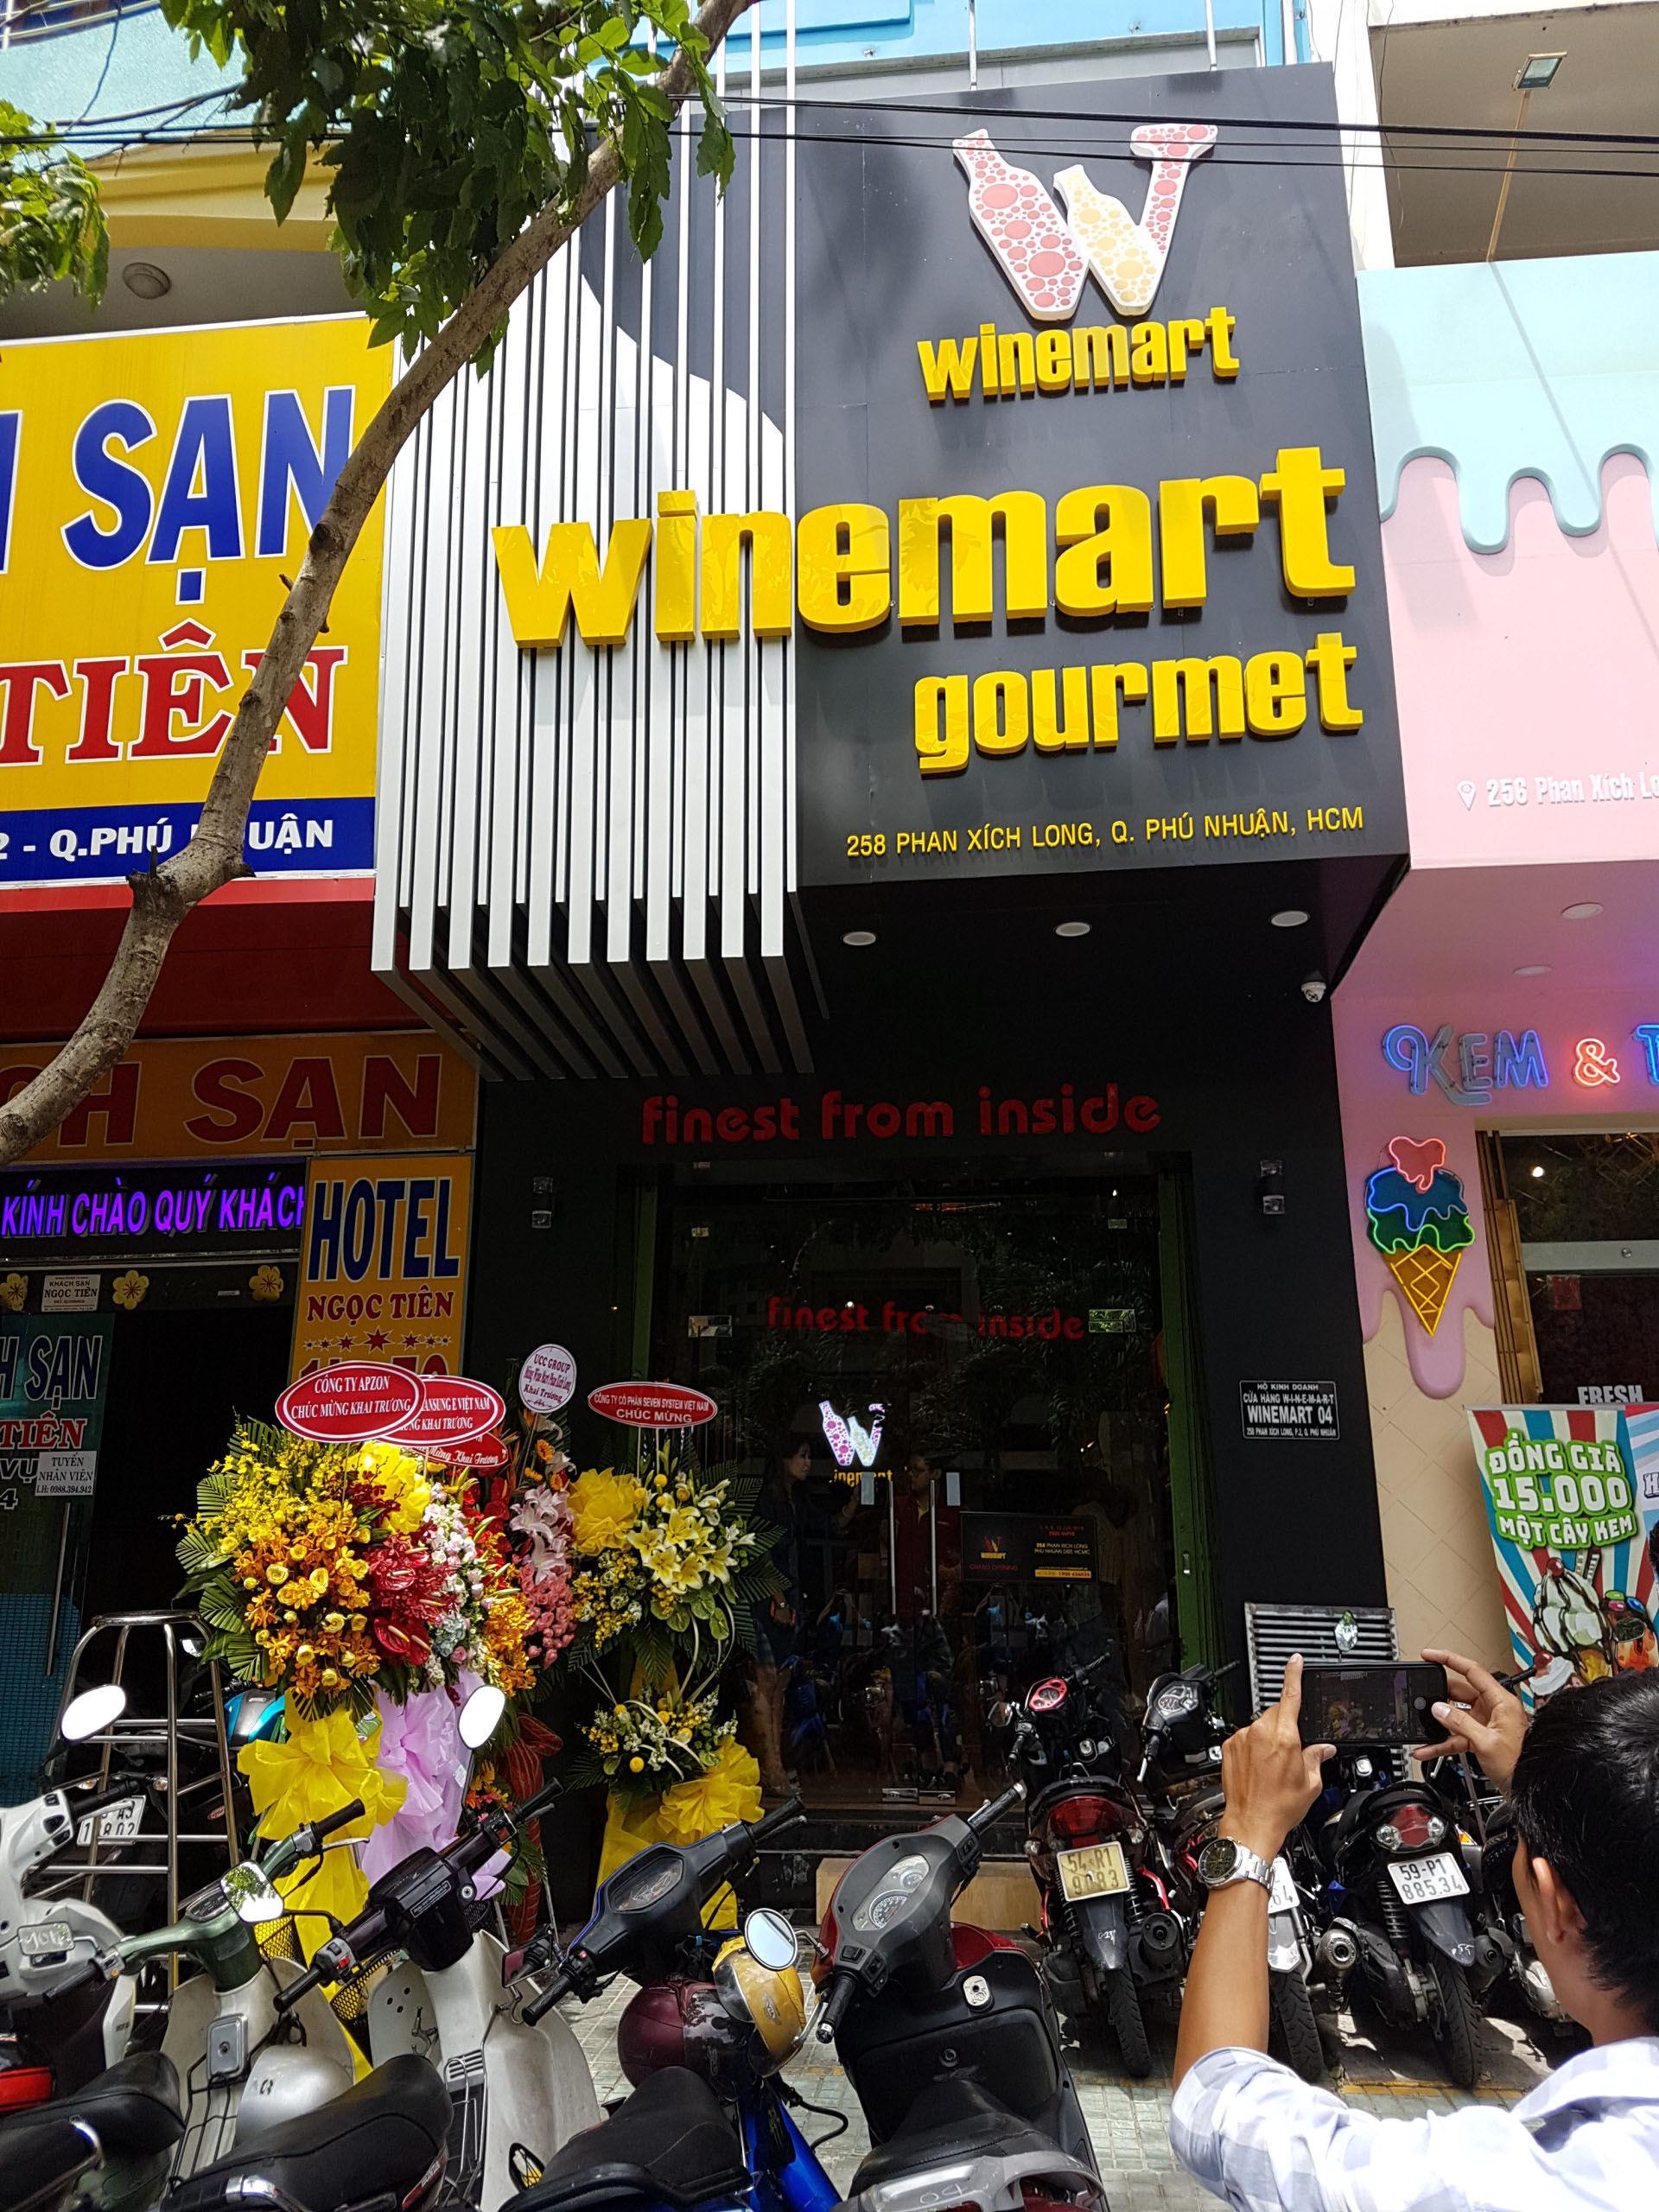 Winemart_Phan Xich Long